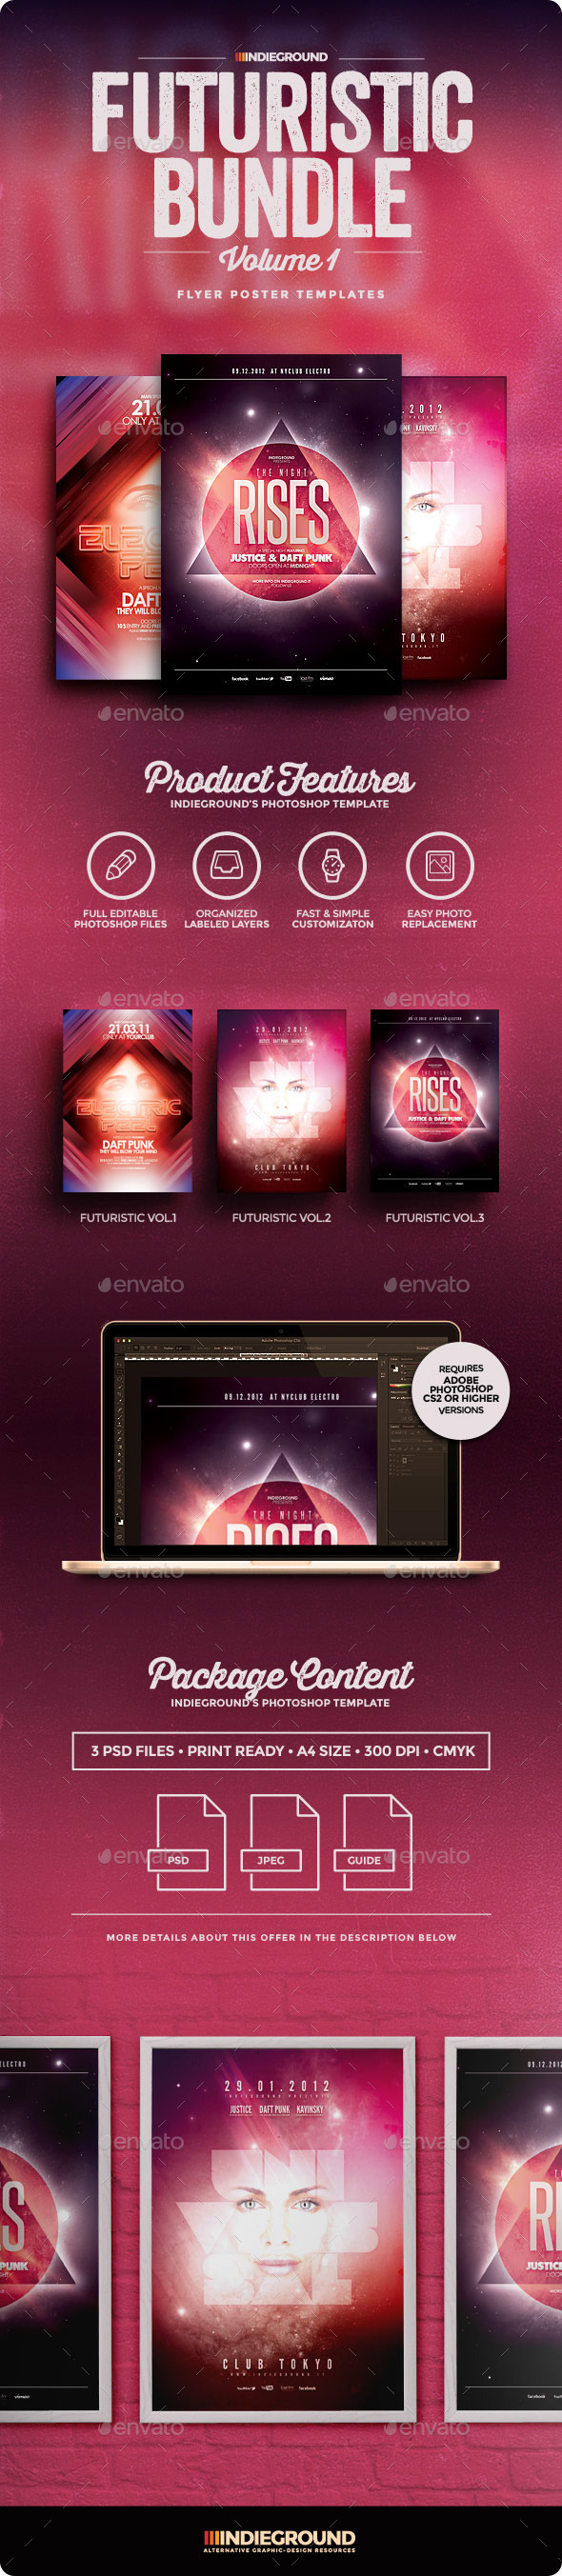 Futuristic Flyer/Poster Bundle Vol. 1-3 - Clubs & Parties Events